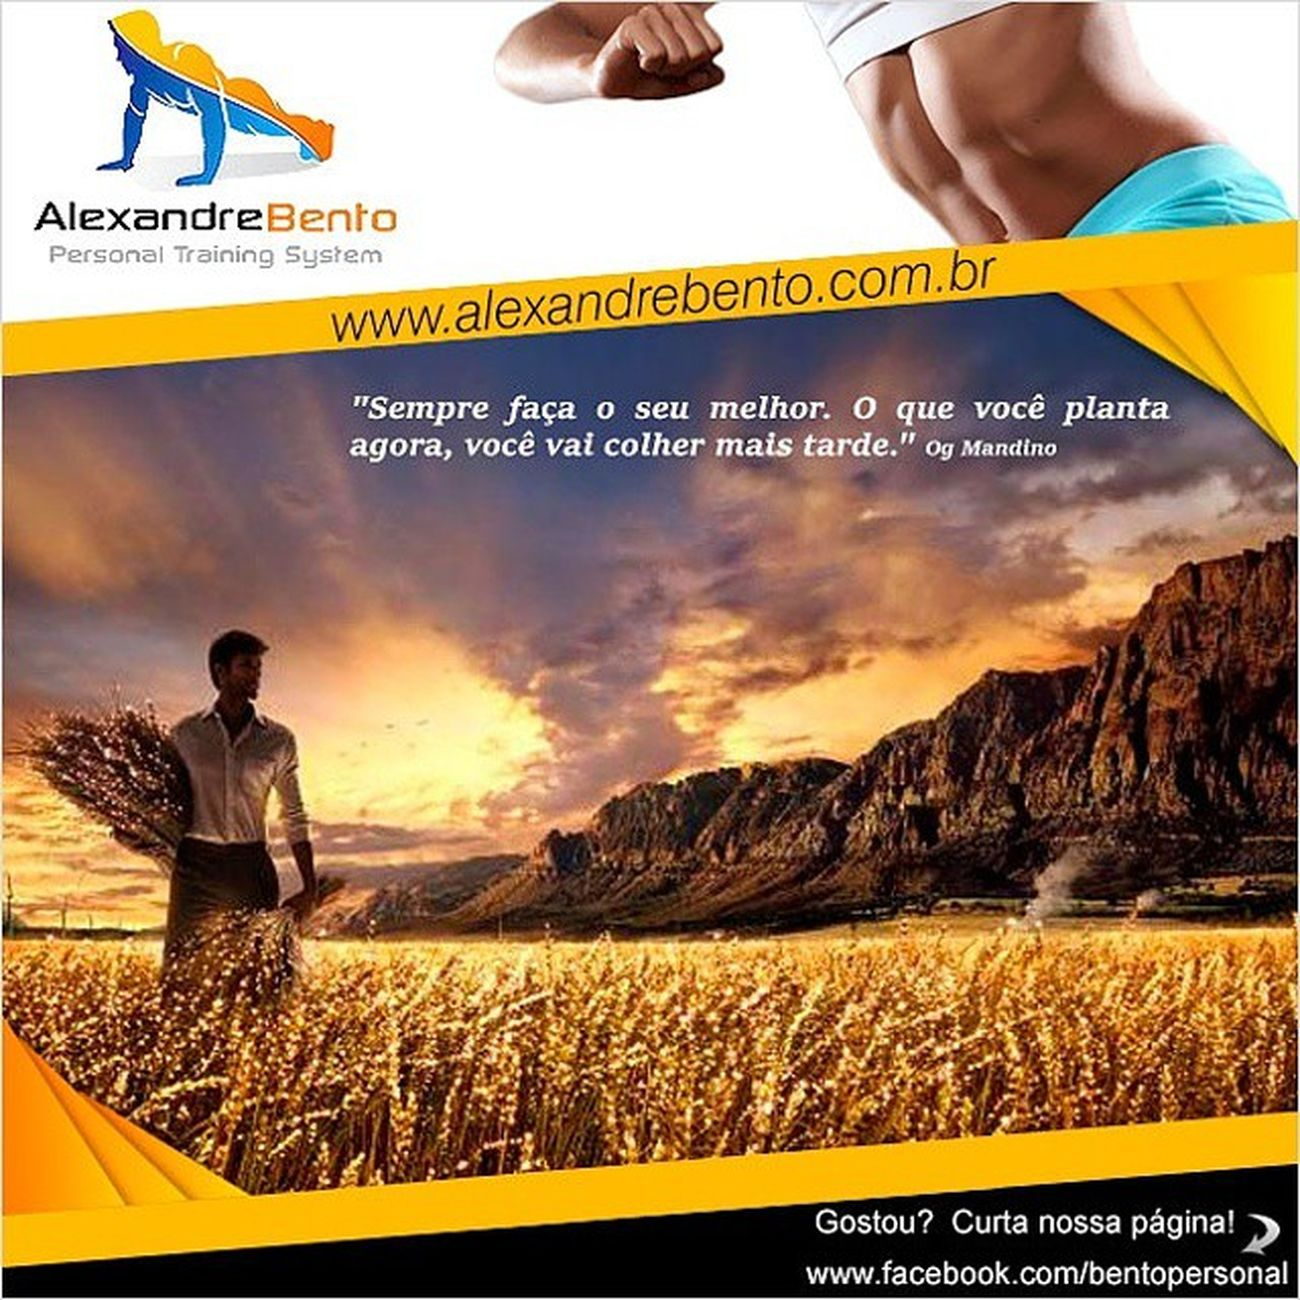 Motivacao , TreinoDeGluteos , Aumentandoosgluteos , Alexandrebento , treinamentofuncional, fitness, functionaltraining, trxtraining, personaltrainer, fikagrandeporra, gluteos, saude, hipertrofia, perdadepeso, motivacao, emagrecer, perderpeso